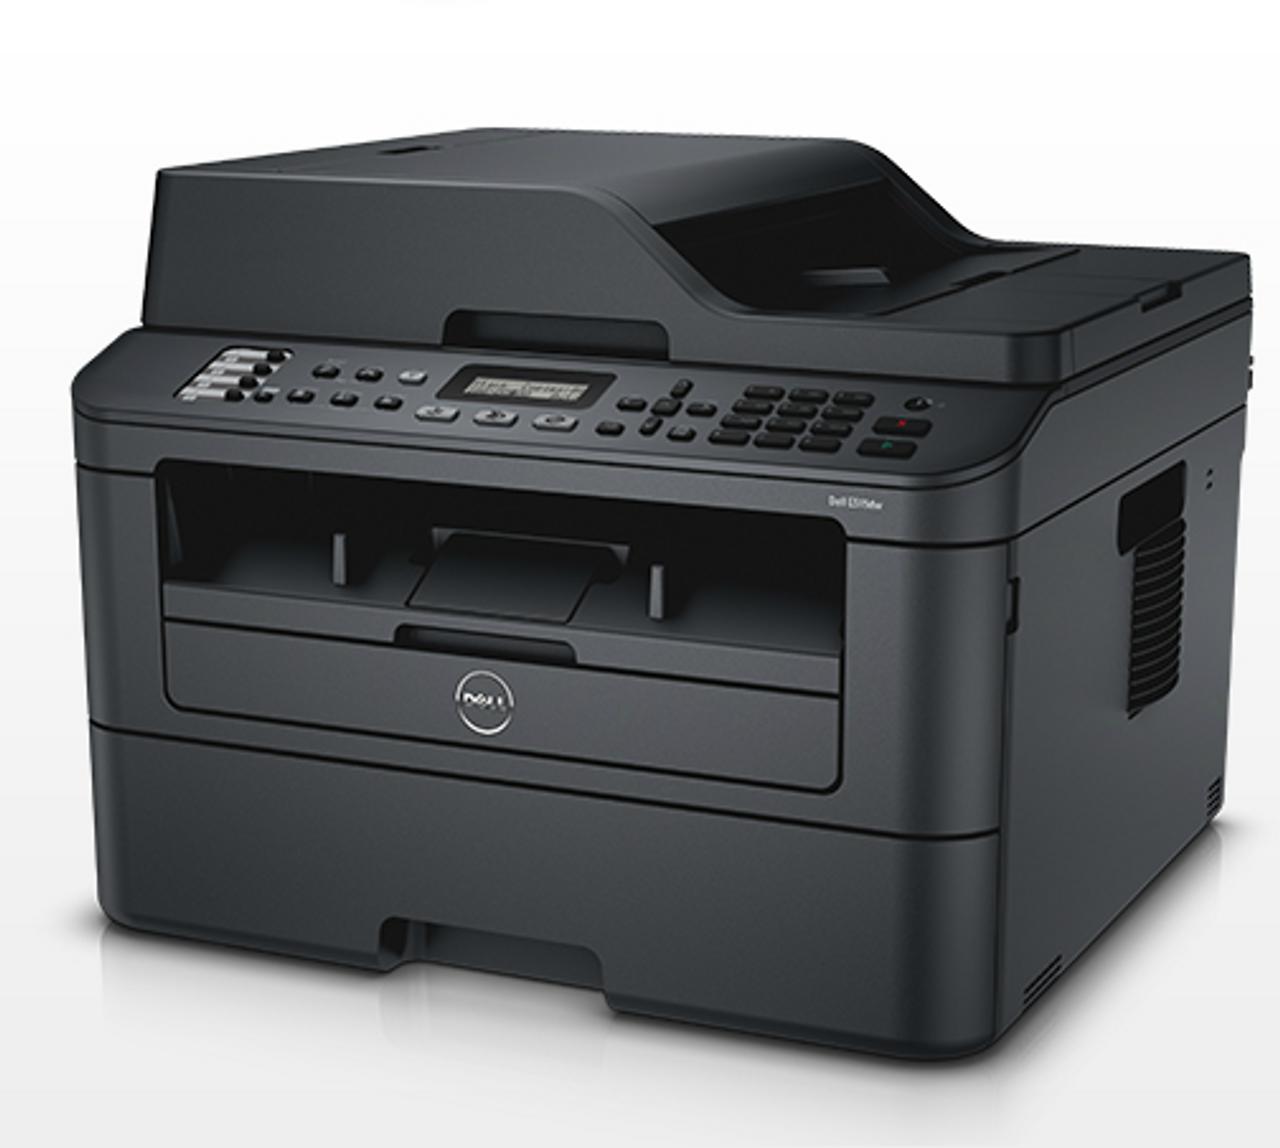 Dell E515DW Laser Multifunction Printer Monochrome Plain Paper Print